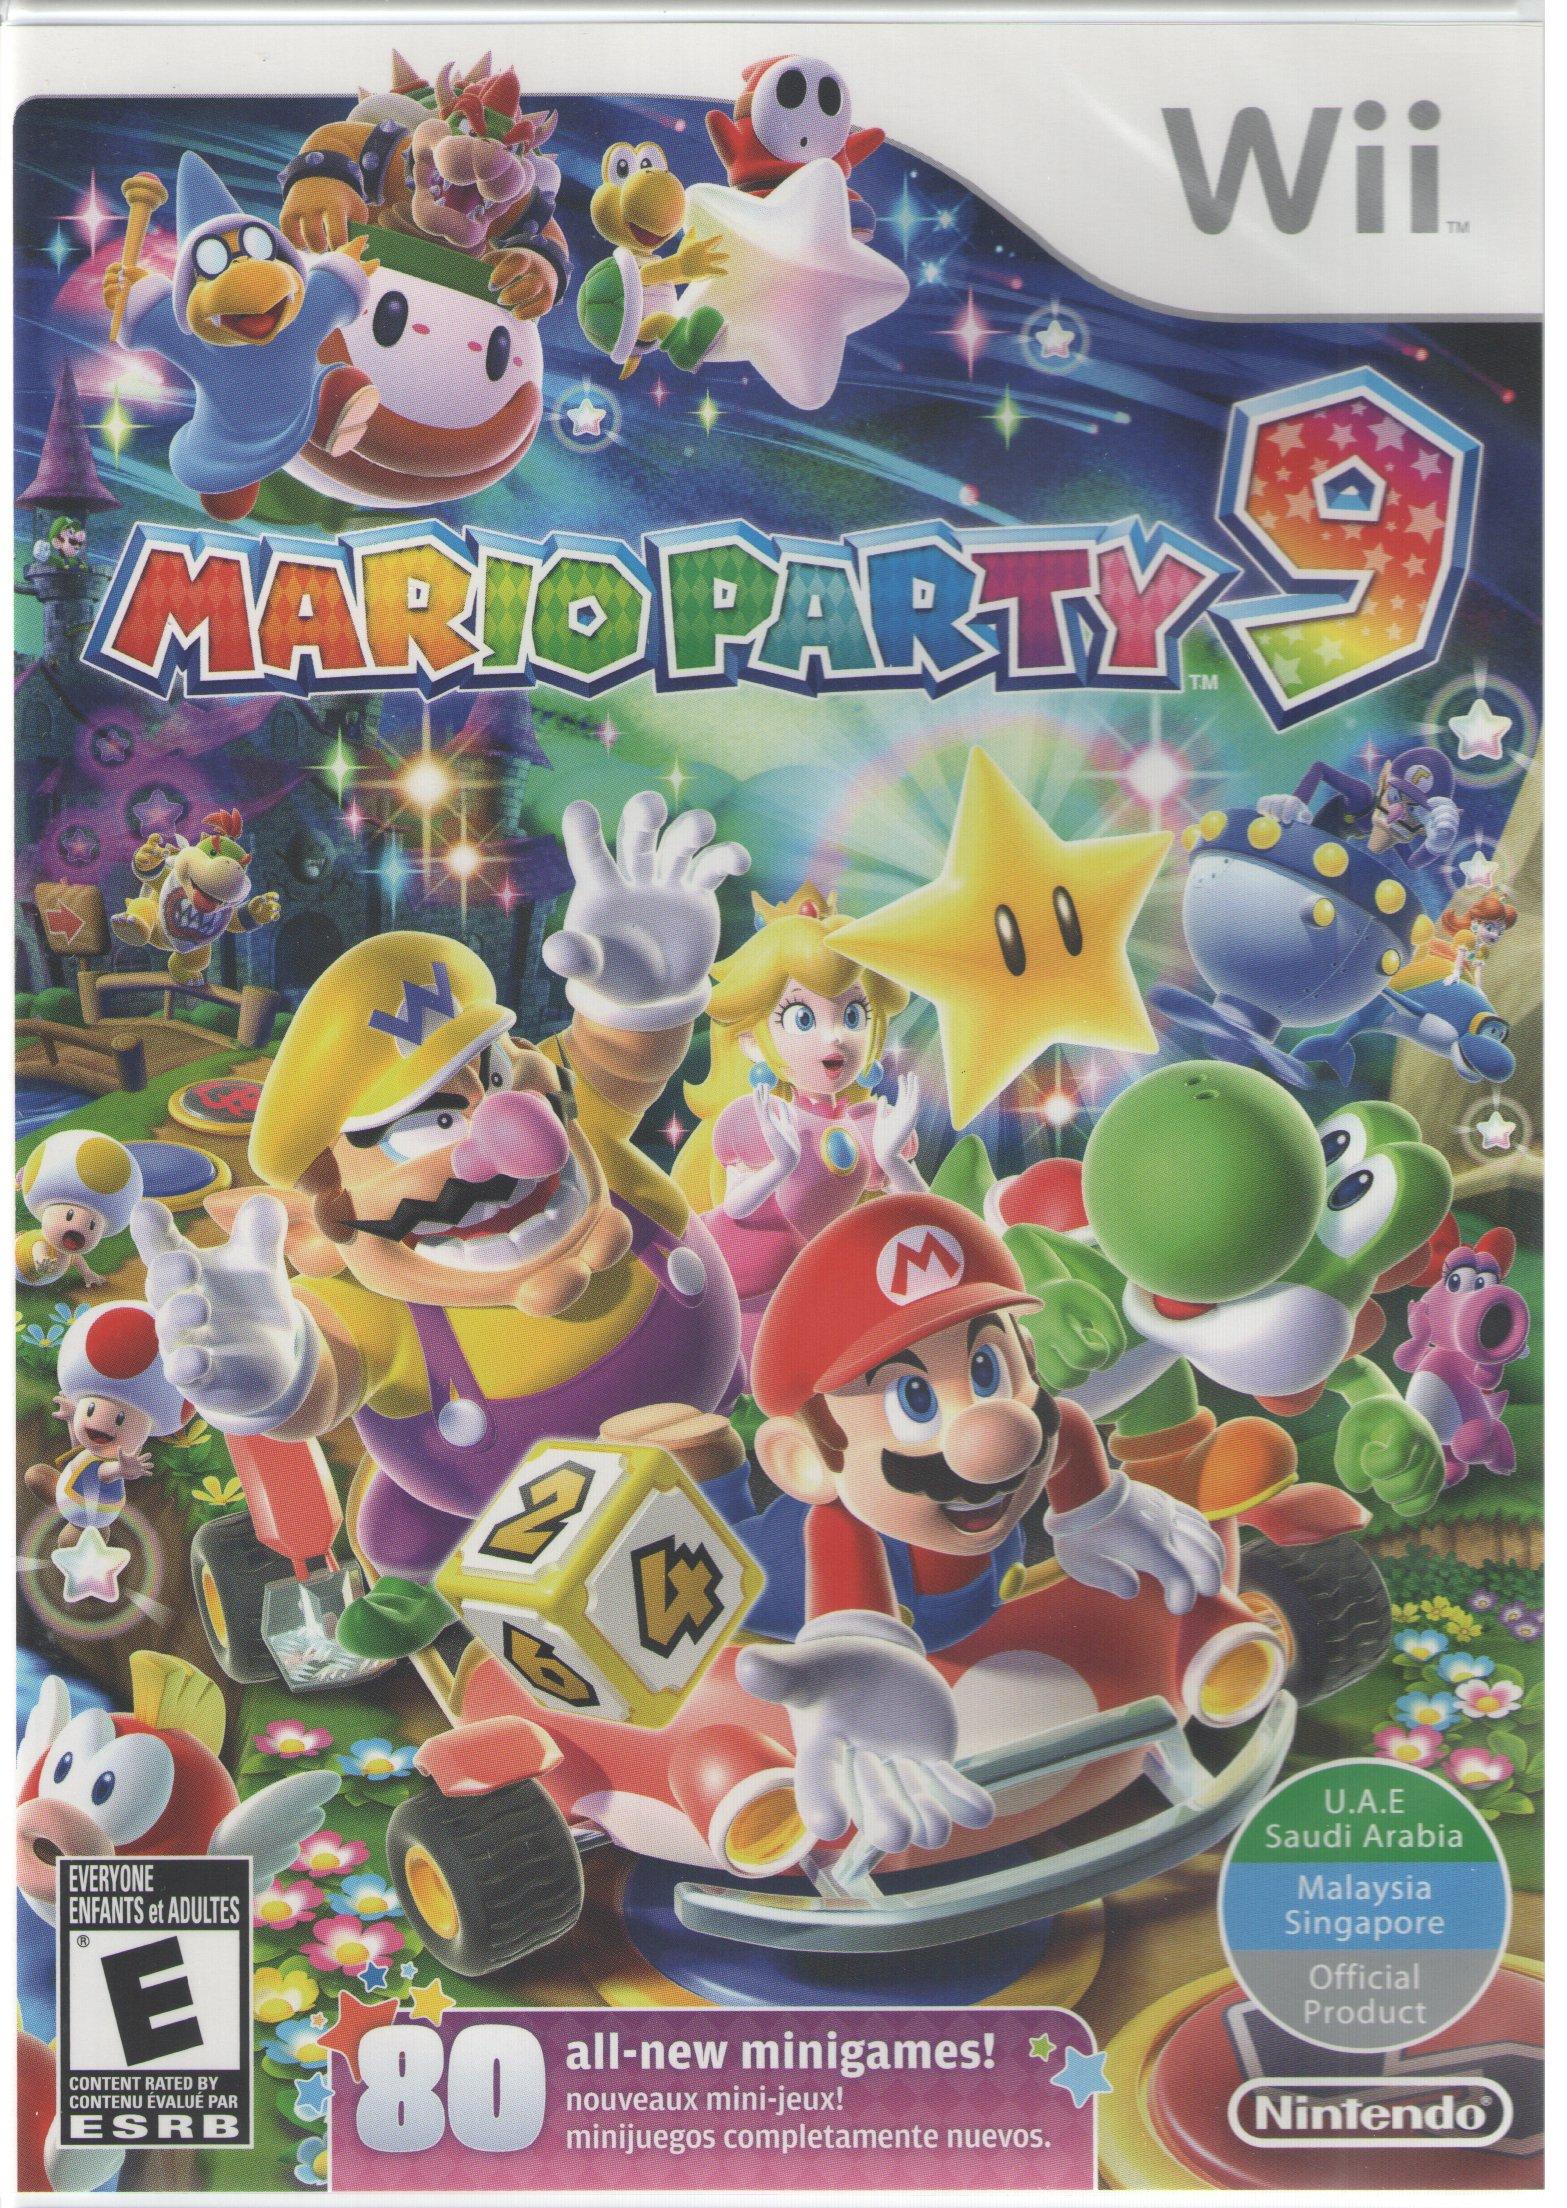 Amazoncom Mario Party 9 World Edition Nintendo Wii Video Games